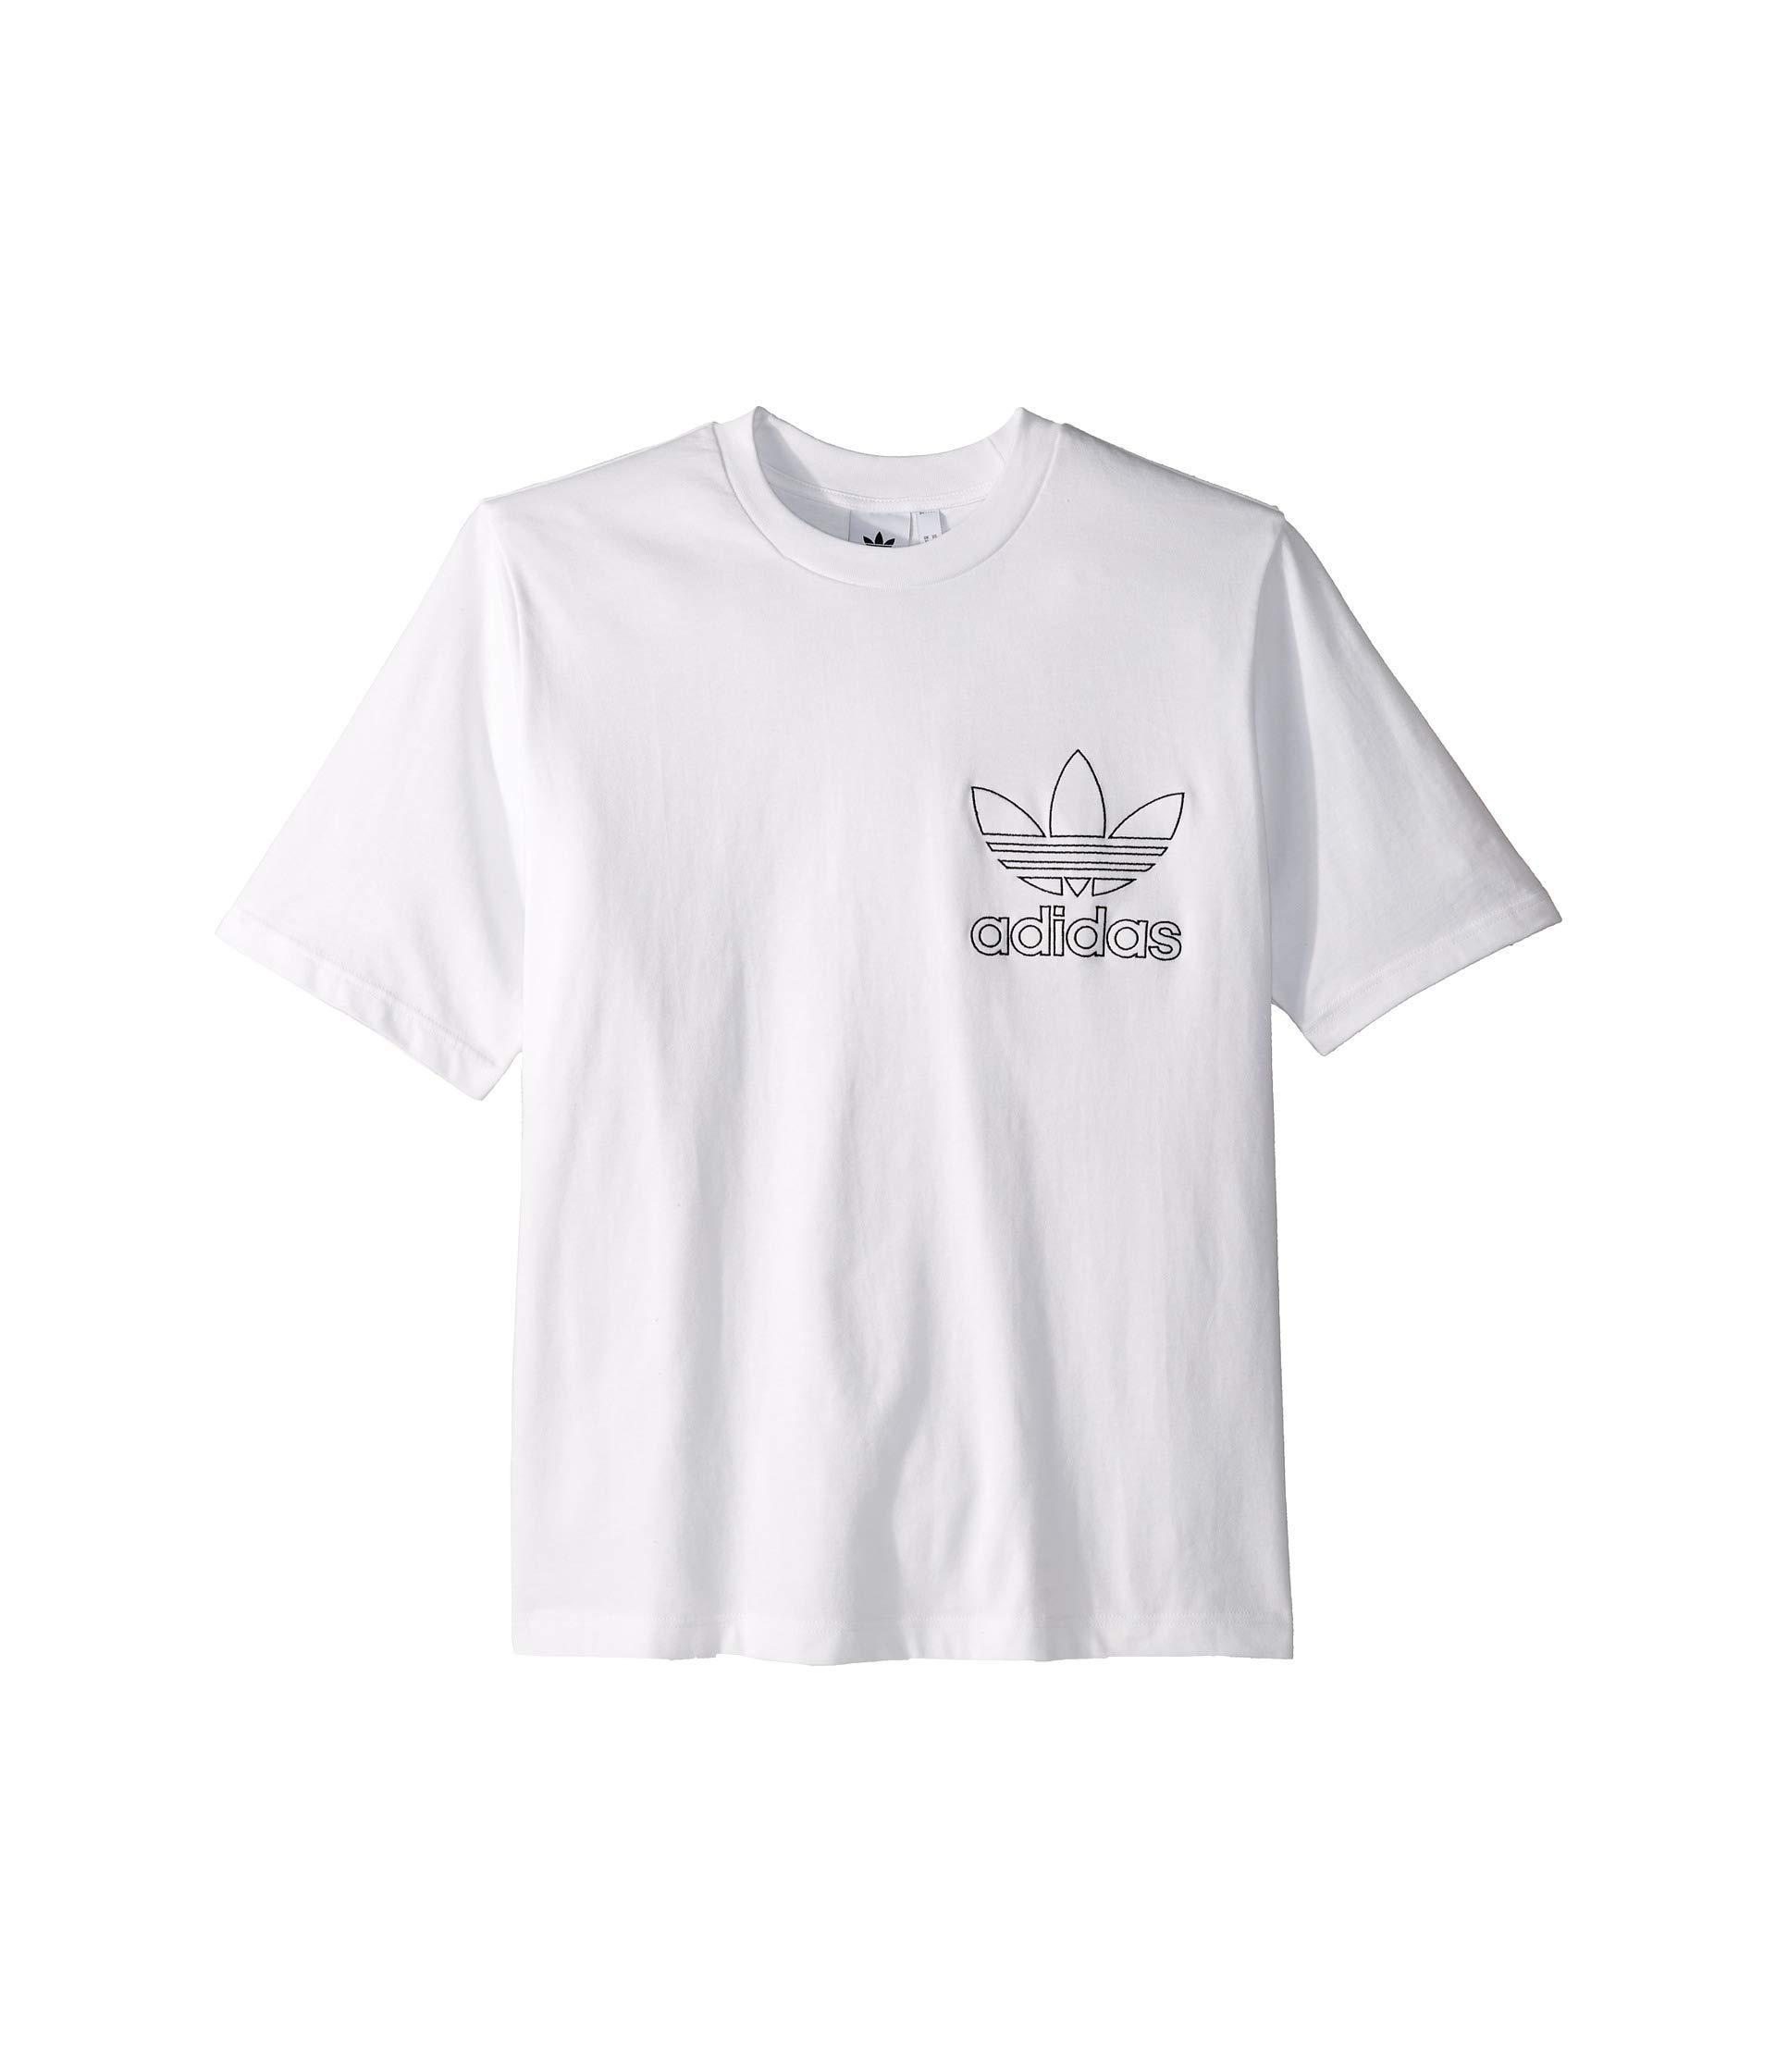 71daa684 adidas Originals Outline Tee (white) Men's T Shirt in White for Men ...